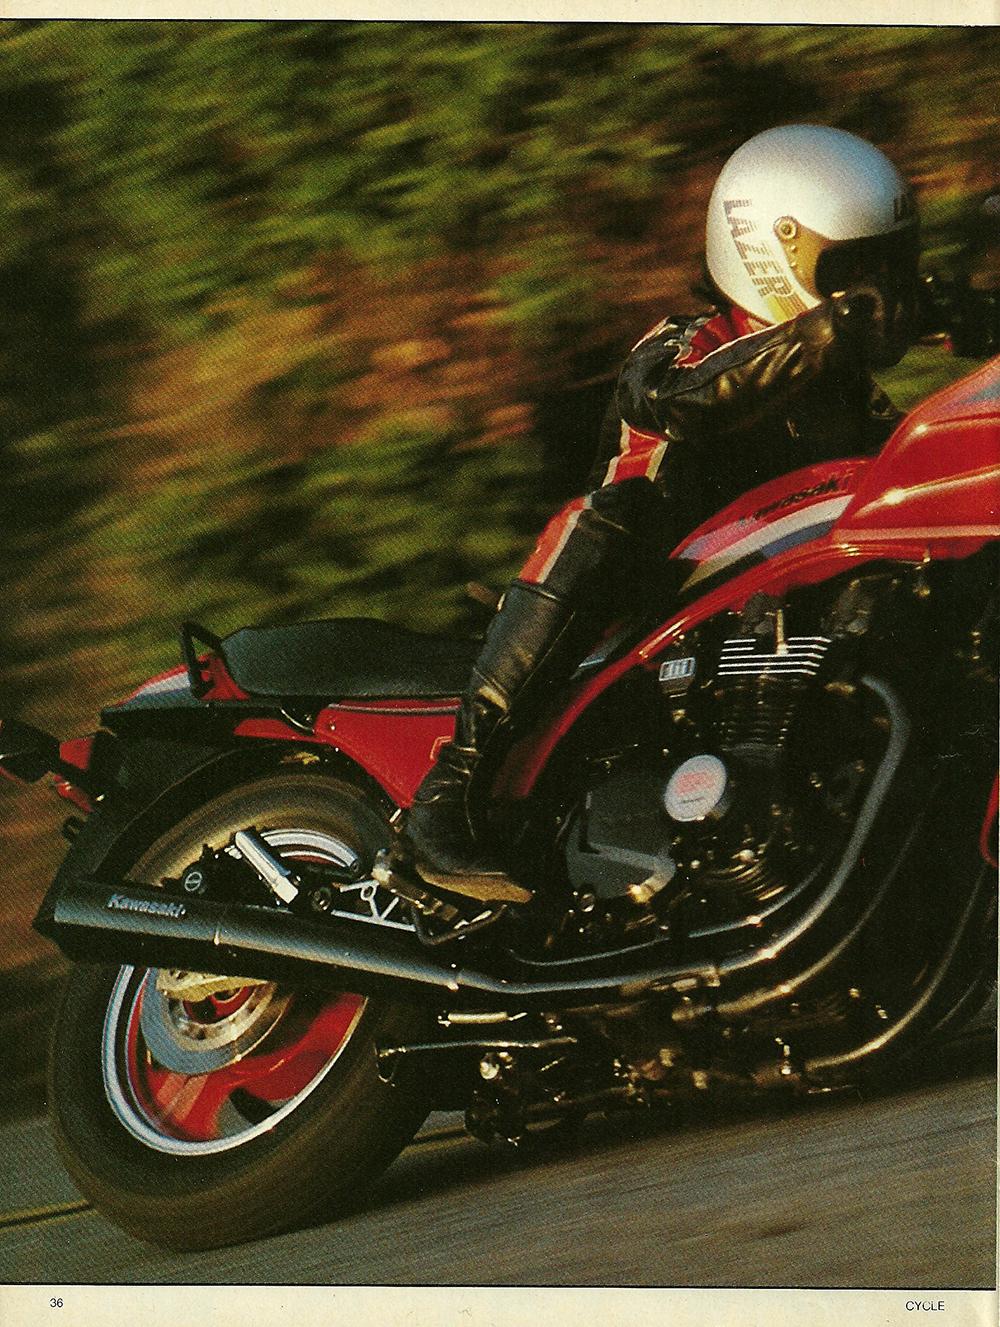 1983 Kawasaki GPz1100 road test 1.jpg